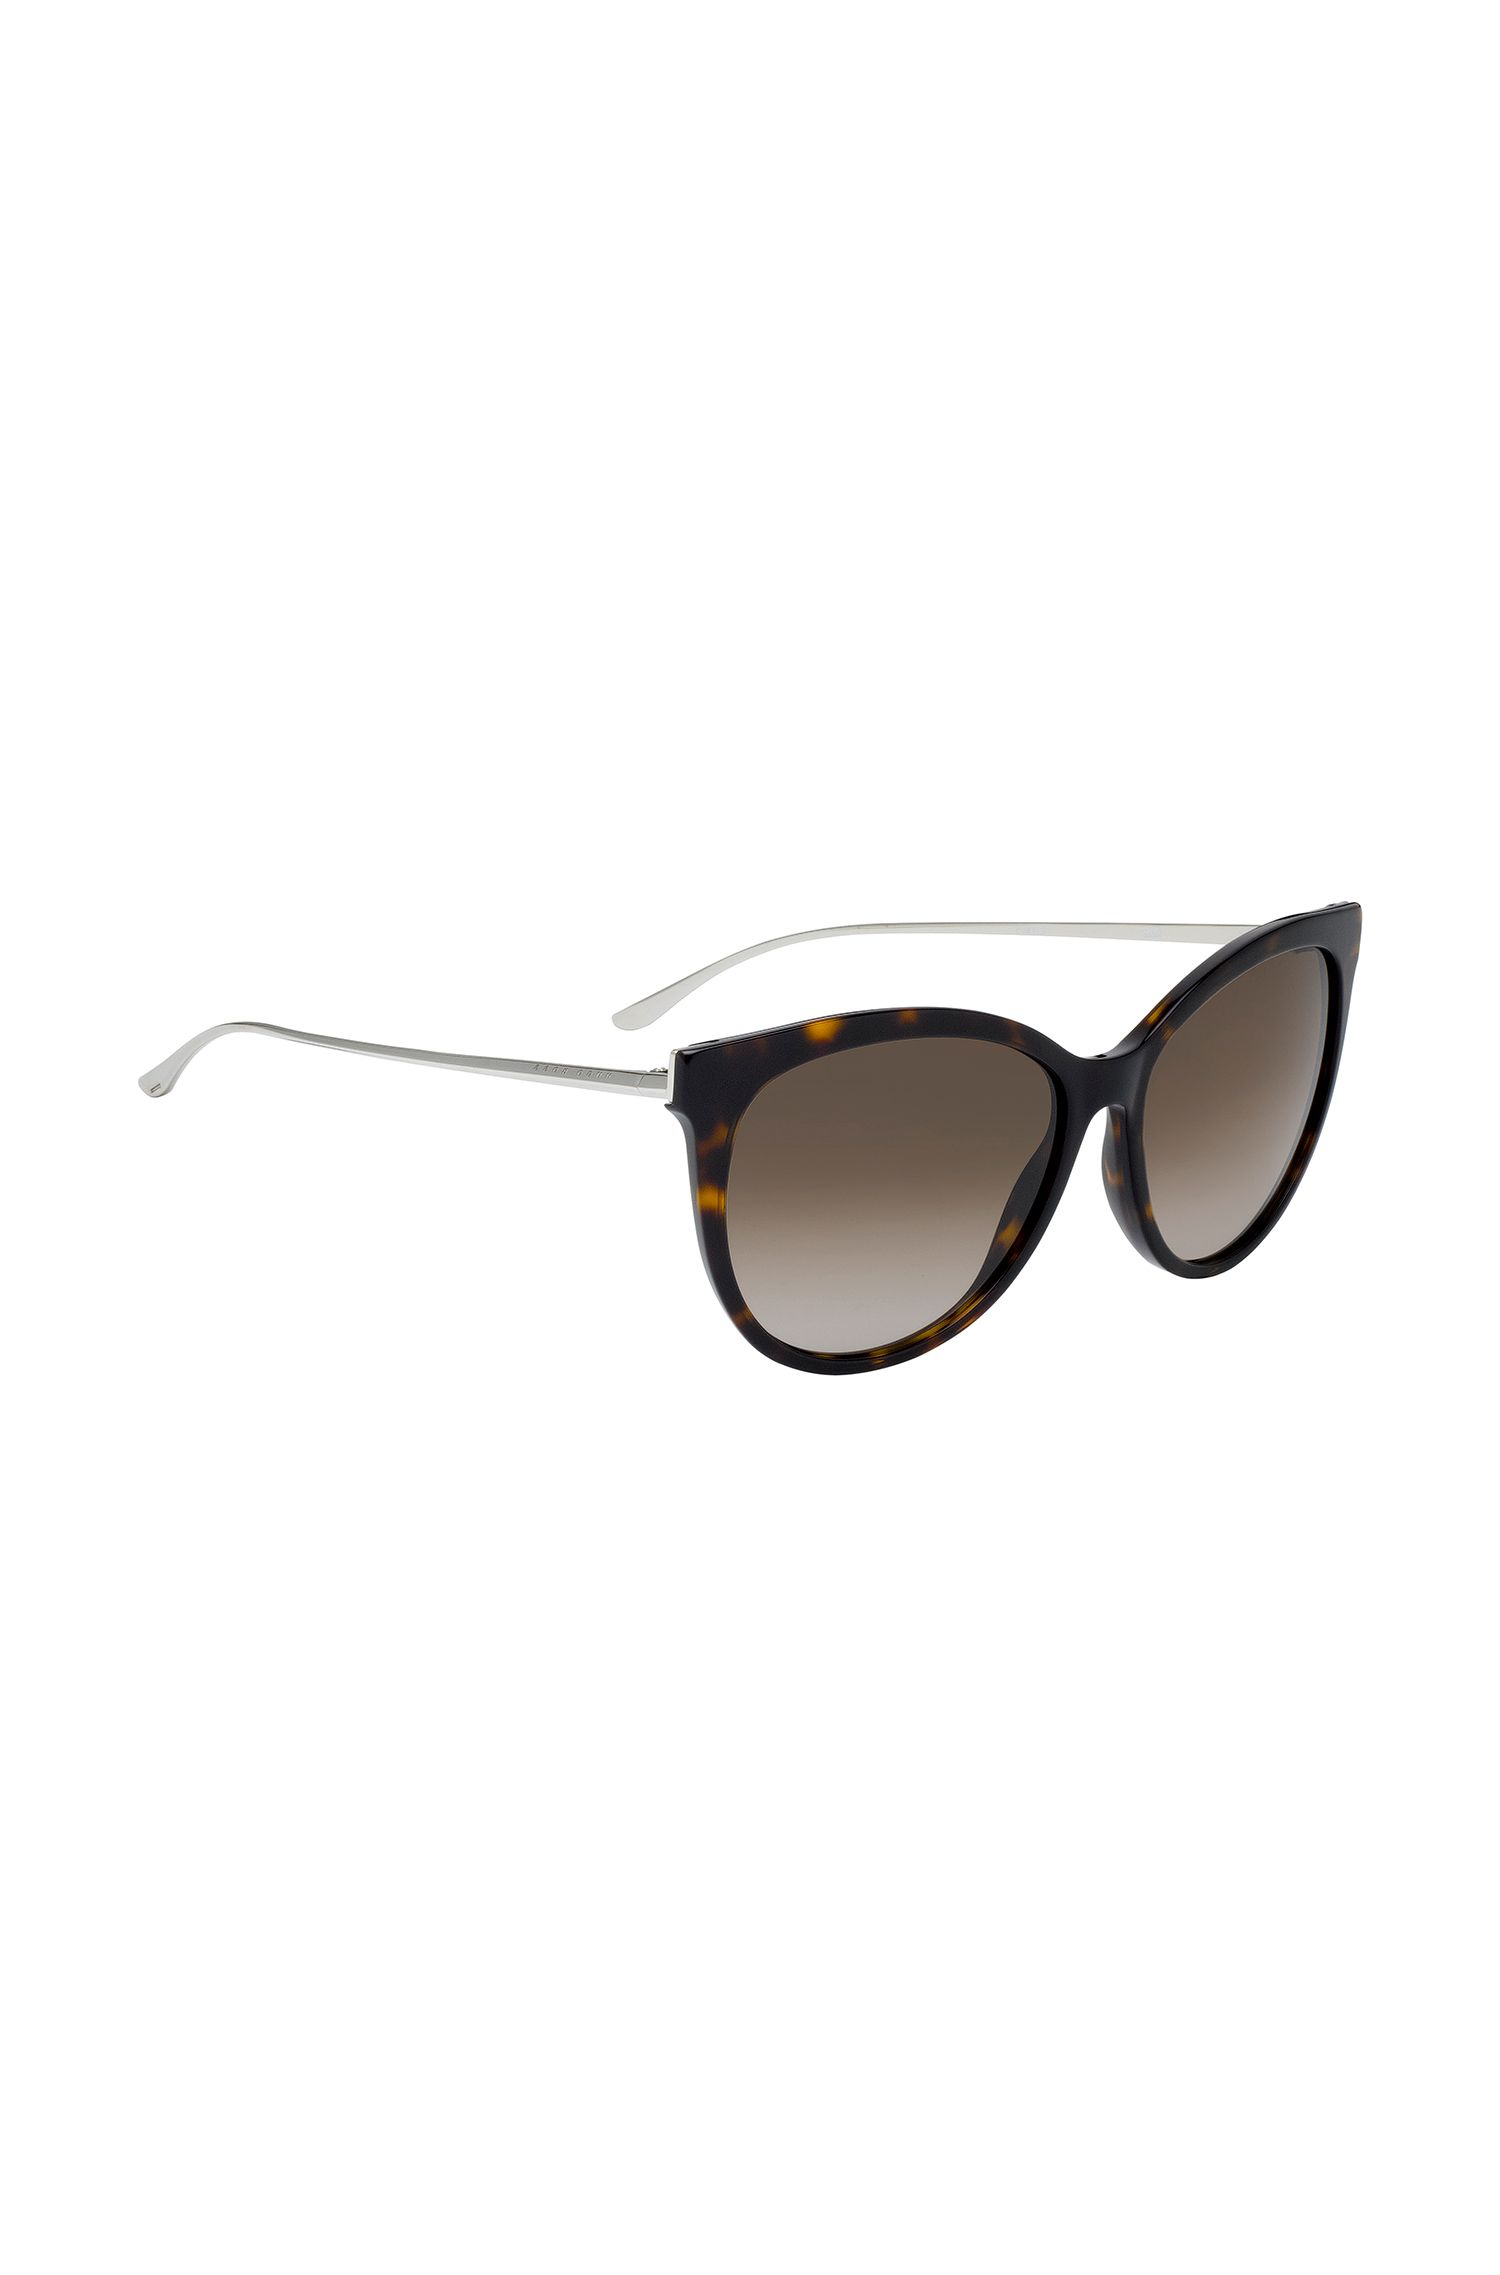 Tortoiseshell Cat-Eye Sunglasses | BOSS 0892S